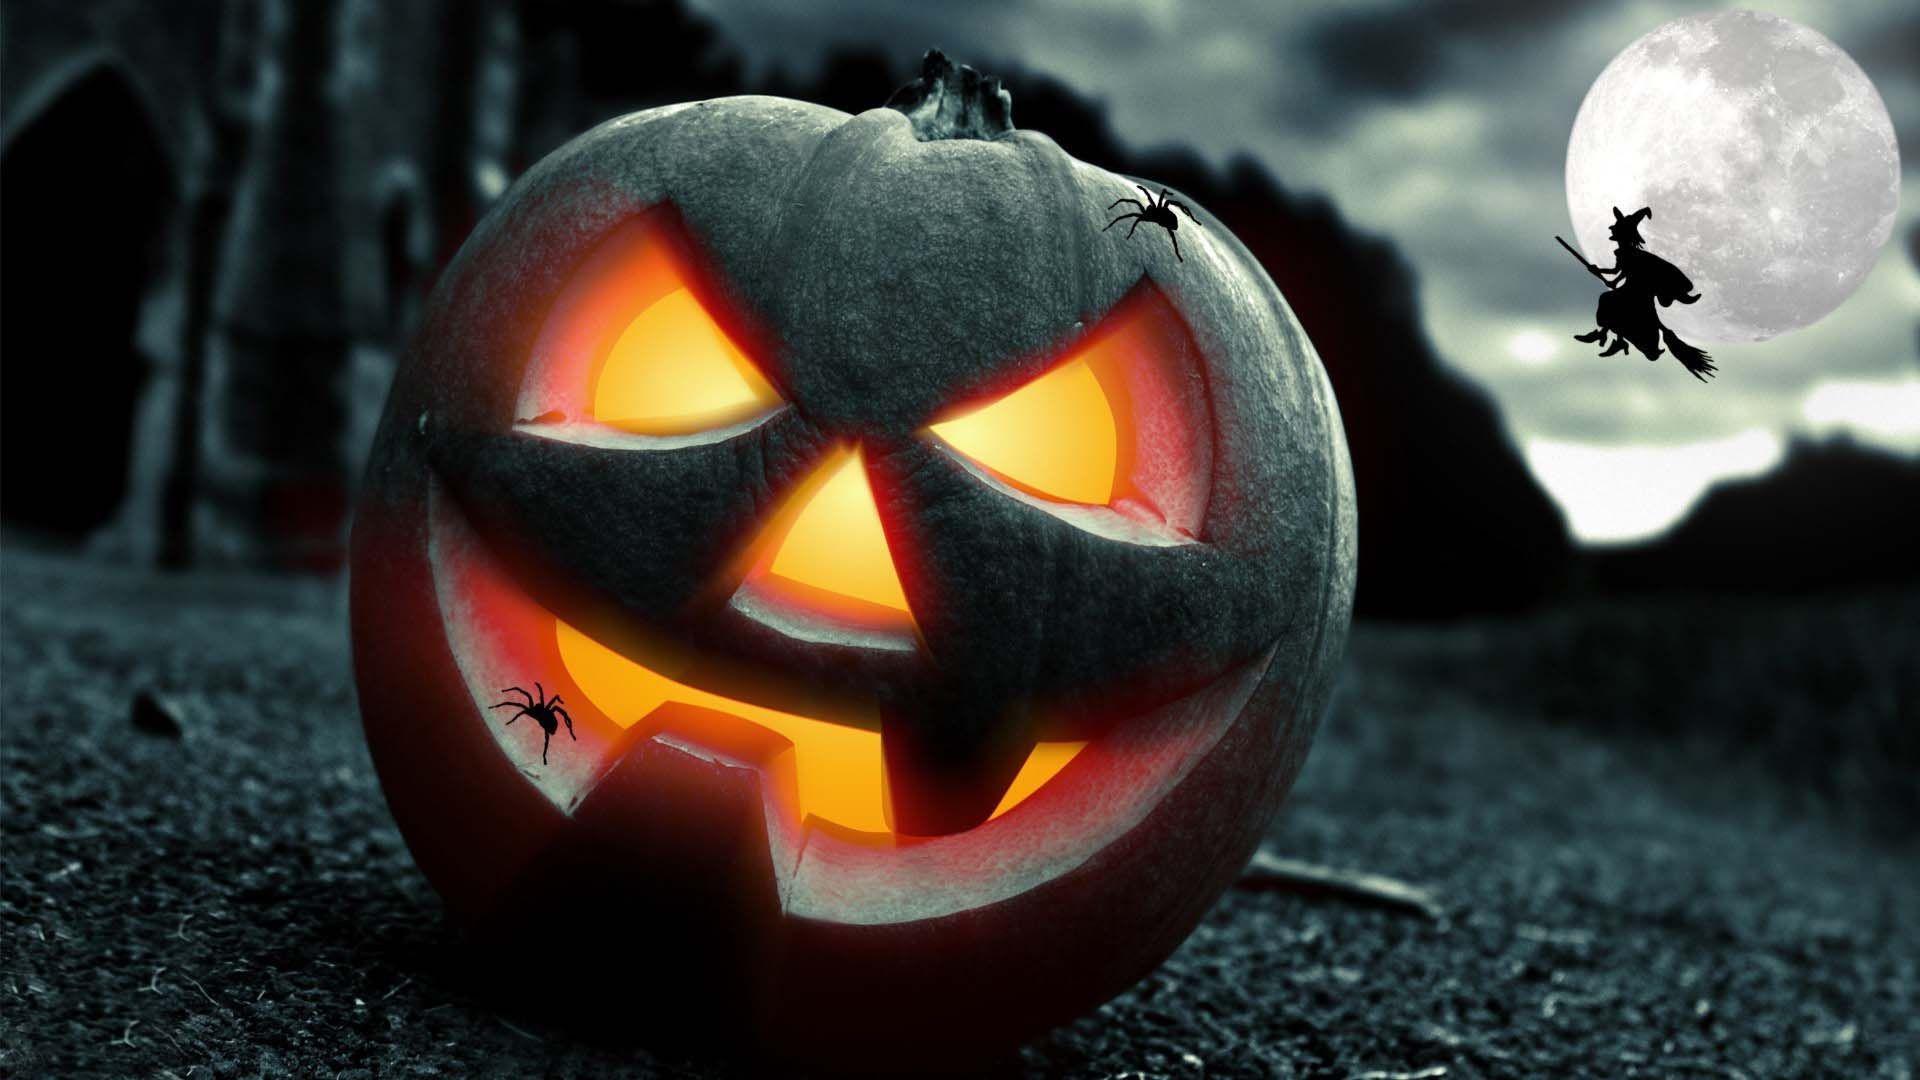 Jack O Lantern Wallpaper Hd Halloween Pumpkins Carvings Pumpkin Carving Halloween Poems